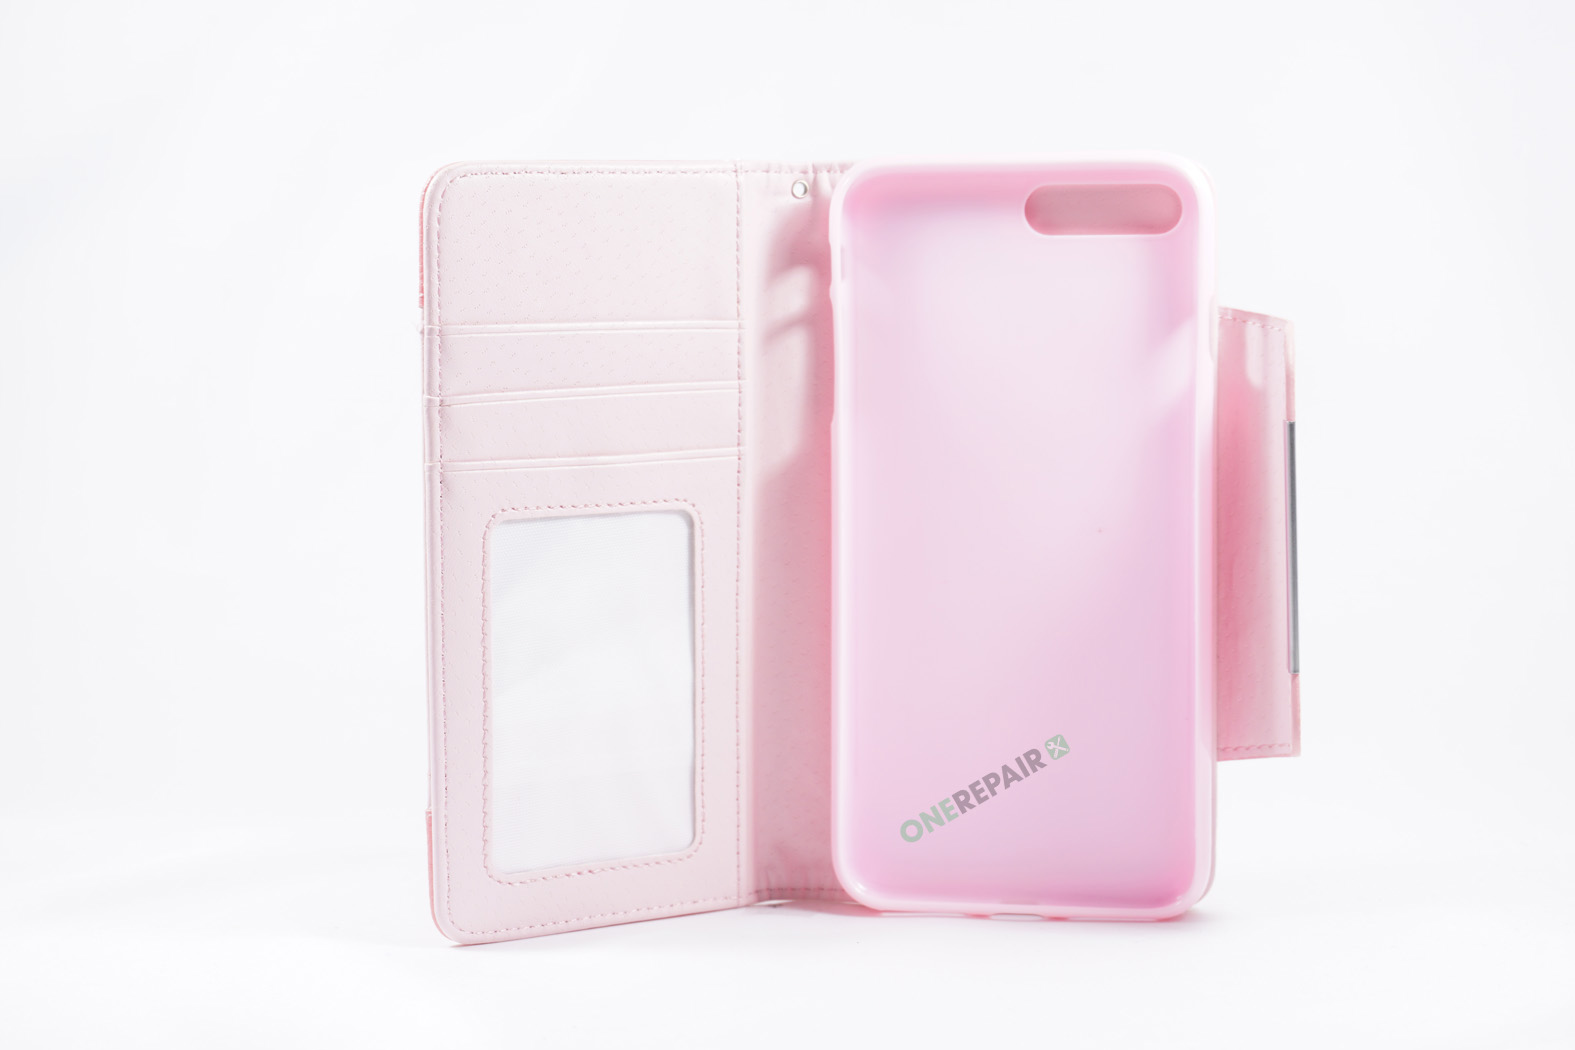 350852_iPhone_7+_8+_Plus_Flipcover_Magnet_Cover_Lyseroed_Pink_OneRepair_WM_00002